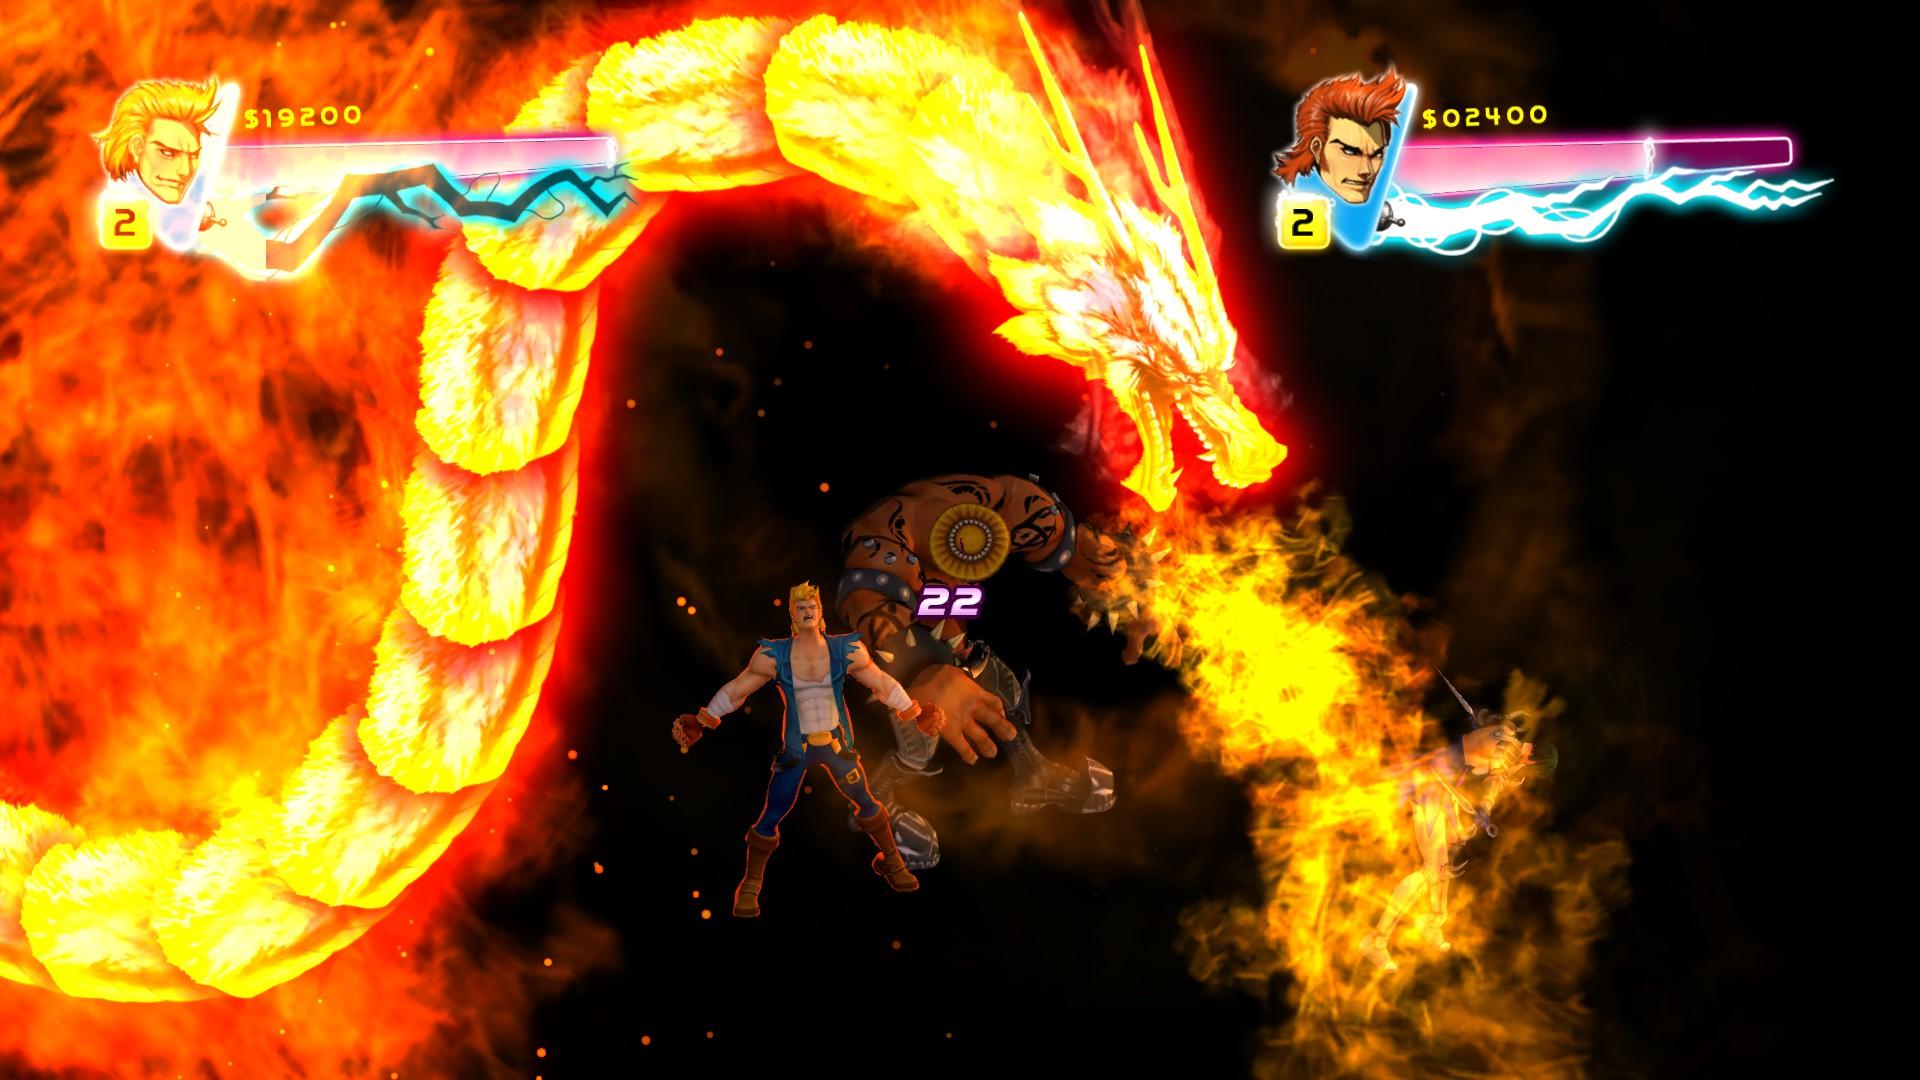 Double Dragon Neon Majesco Entertainment